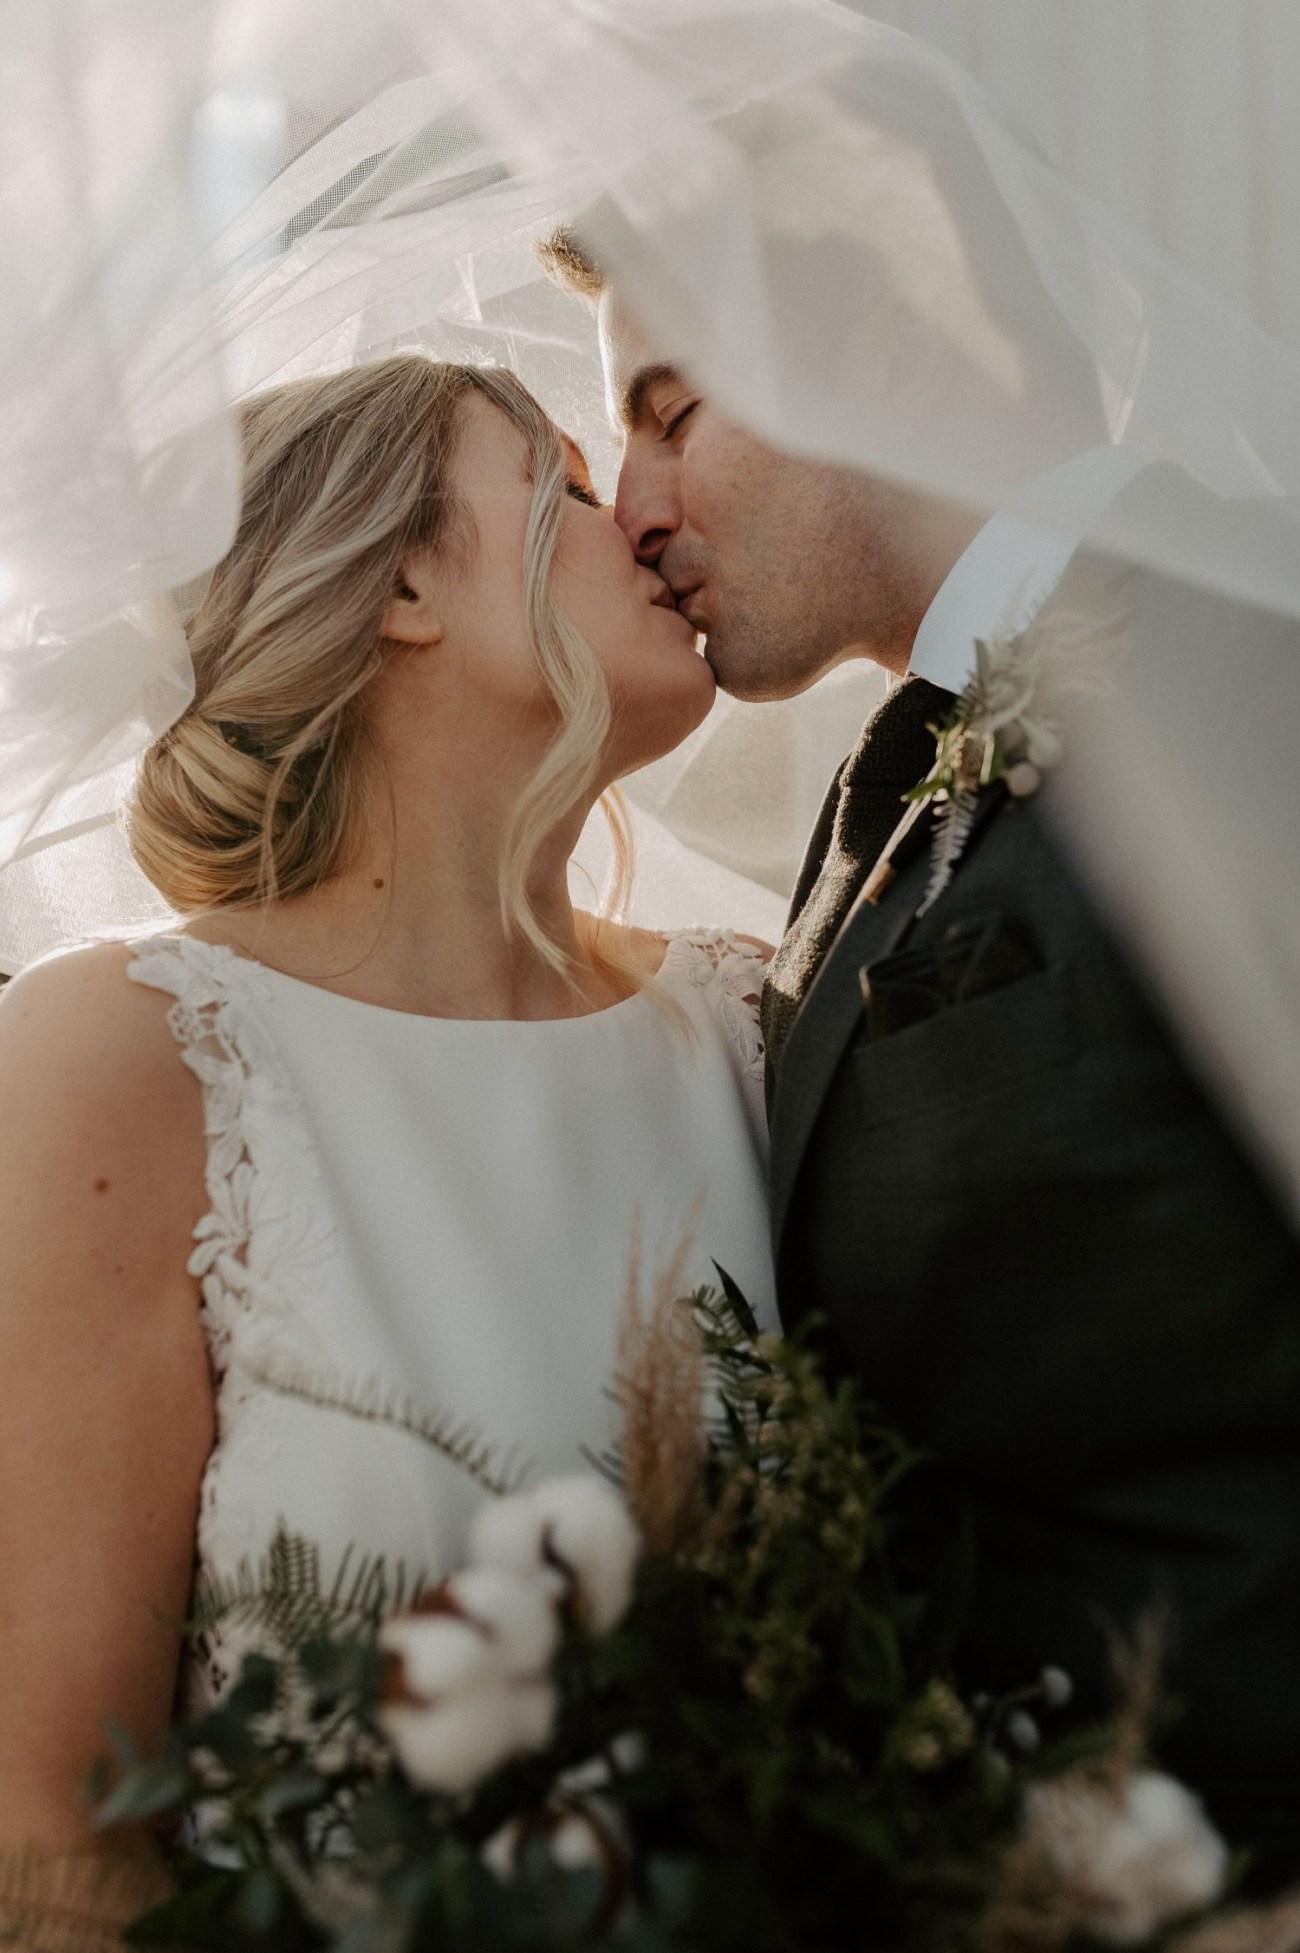 Princeton Battlefield Wedding Princeton University Elopement New Jersey Wedding Photographer Anais Possamai Photography 31